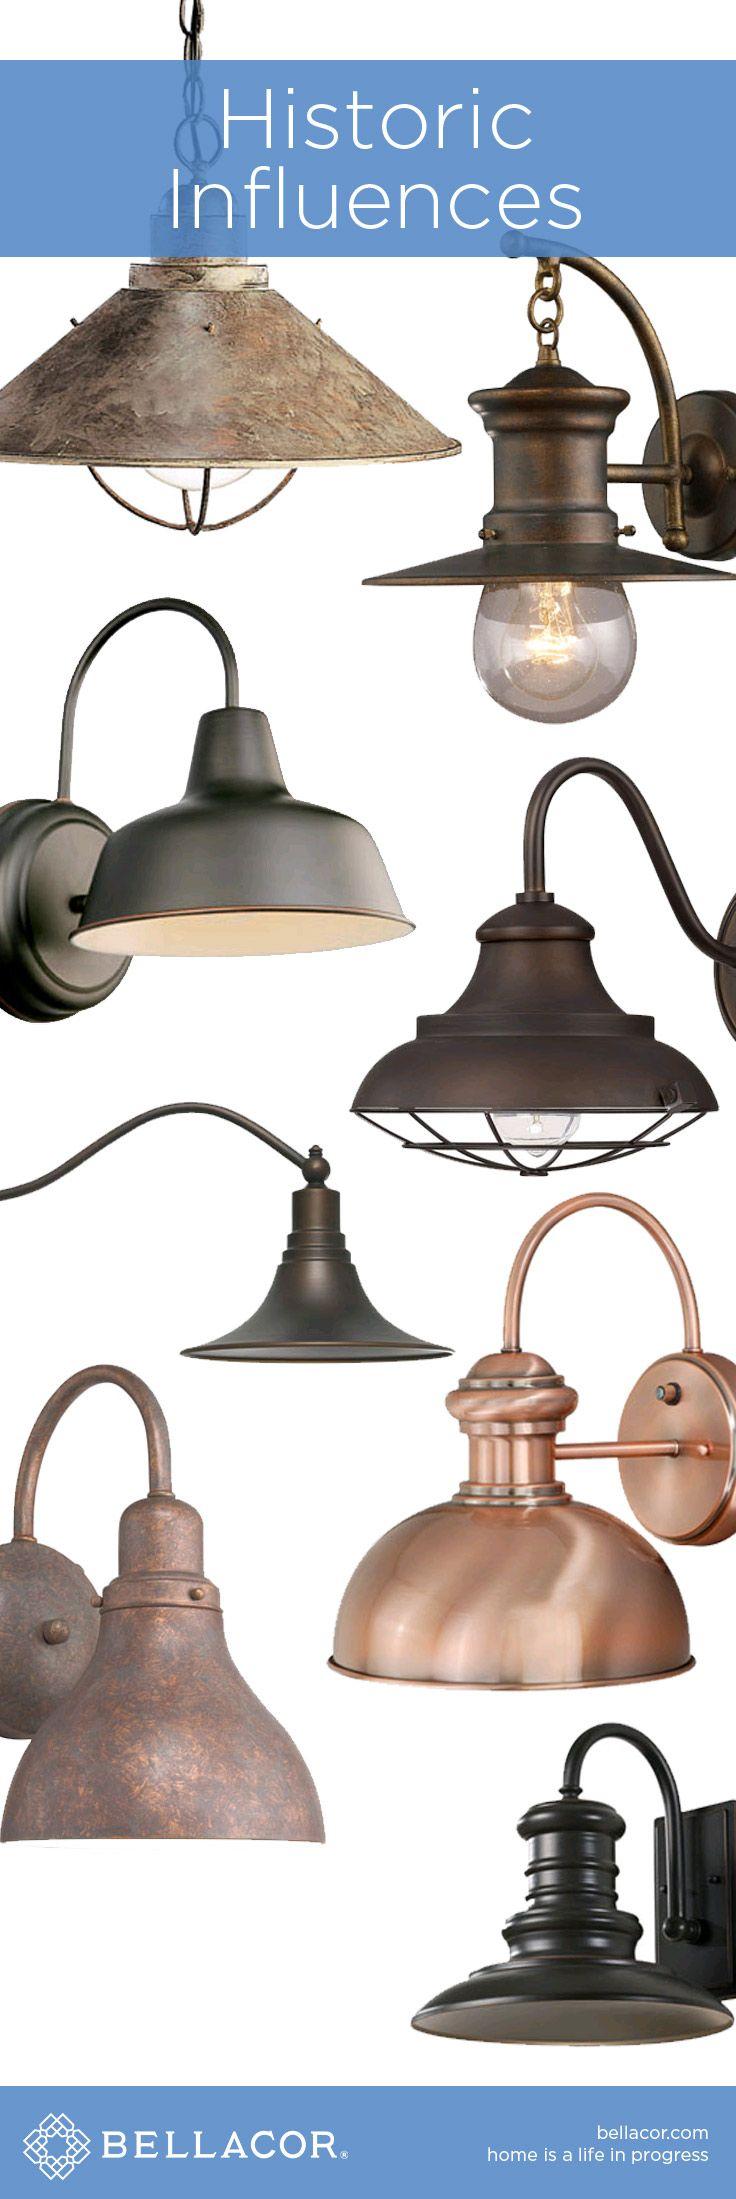 Historic influences on lighting at httpbellacor home historic influences on lighting at httpbellacor arubaitofo Images